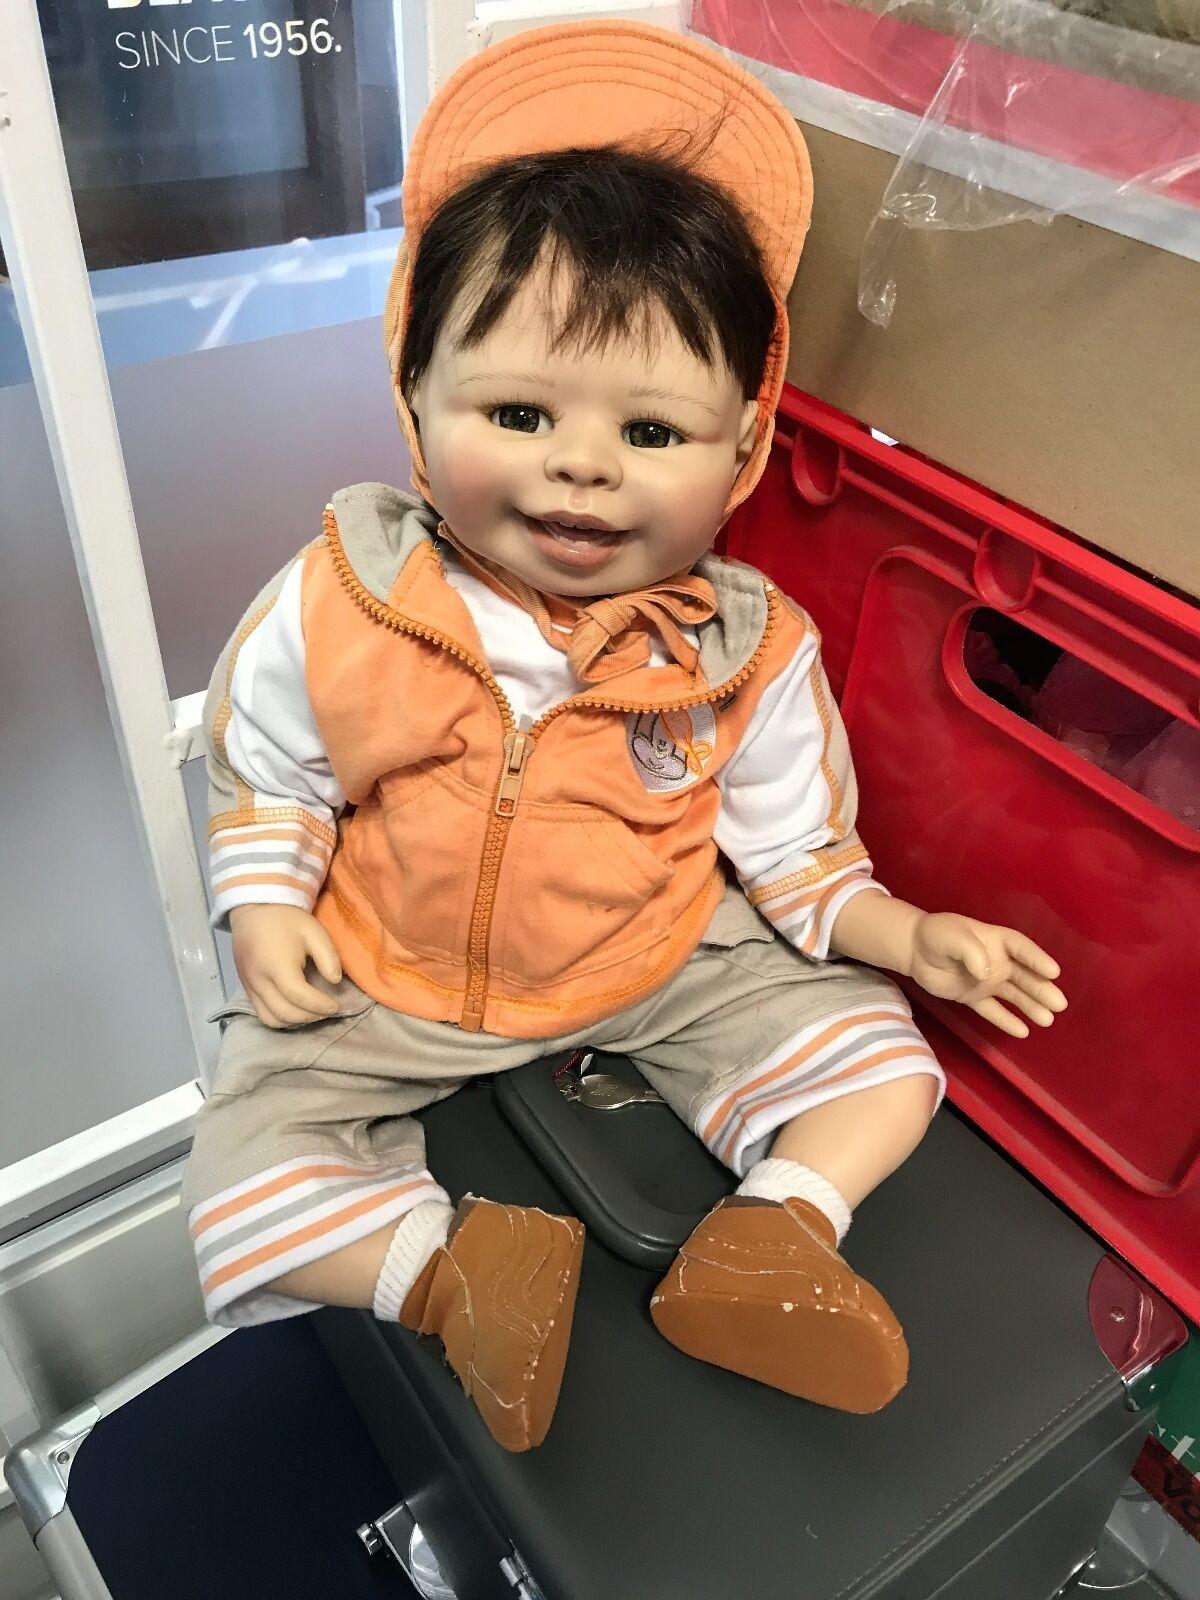 Petra Lechner vinilo muñeca 57 cm. top estado